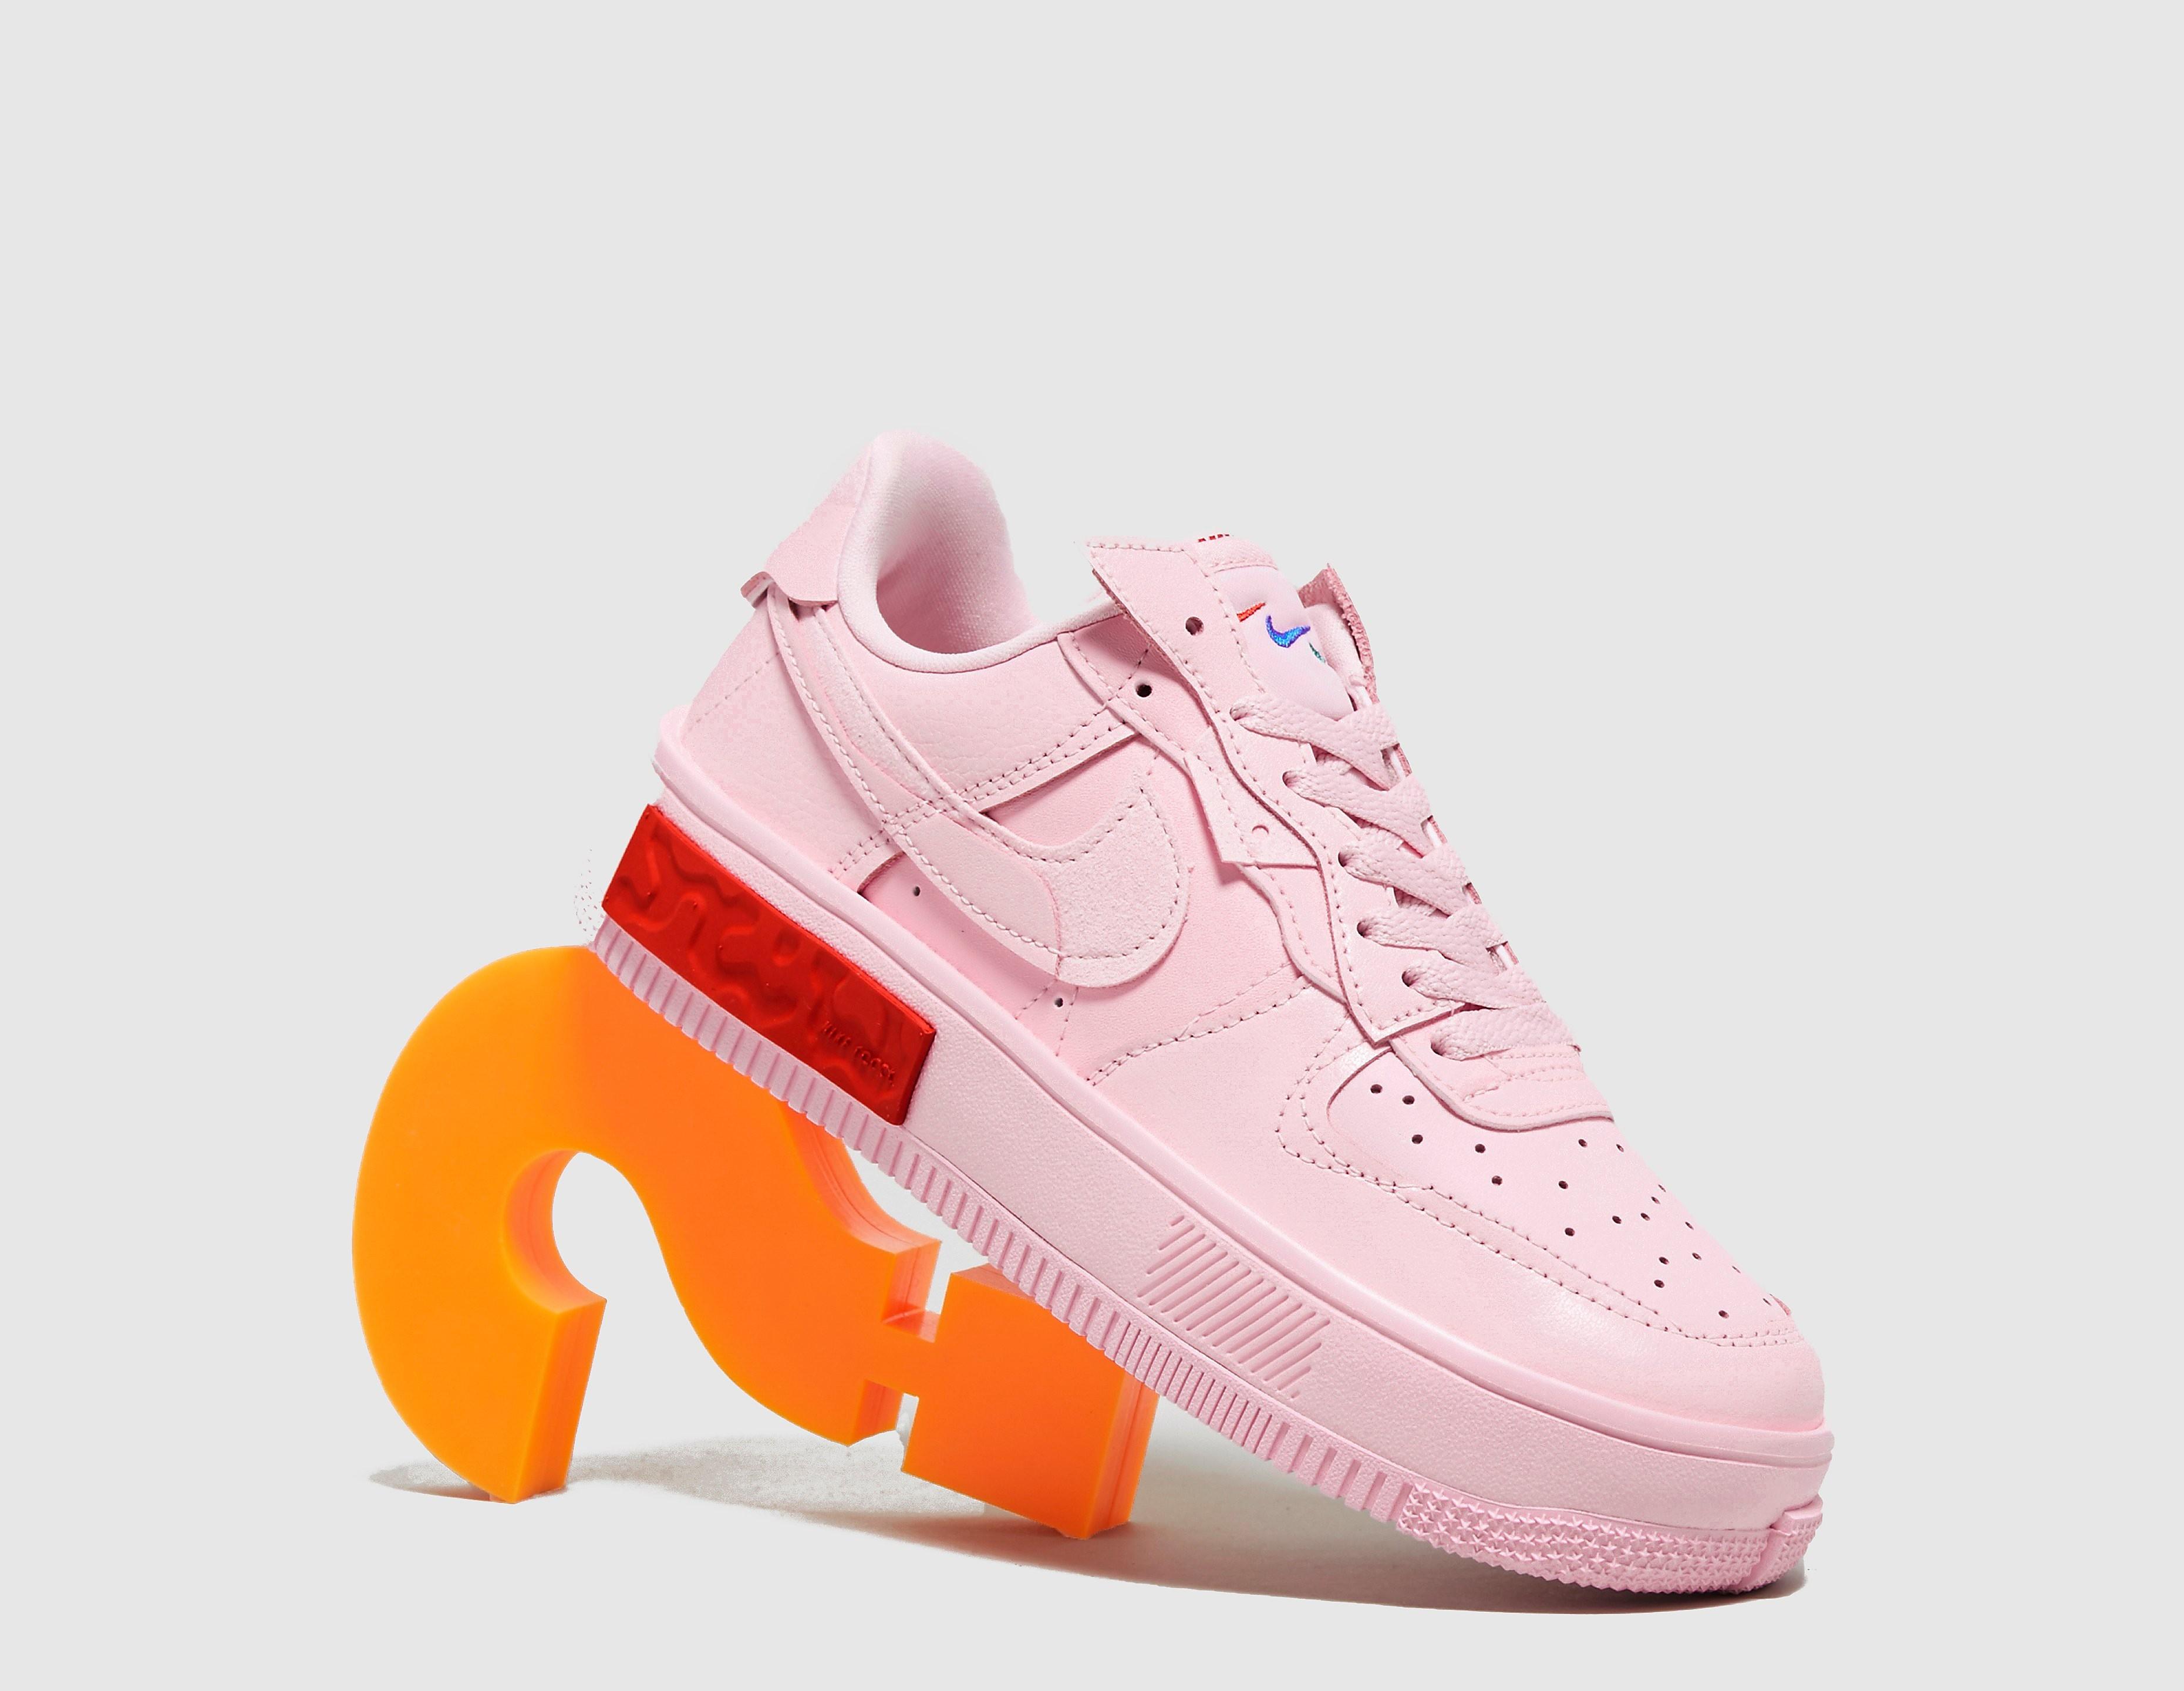 Nike Air Force 1 'Fontanka' Women's